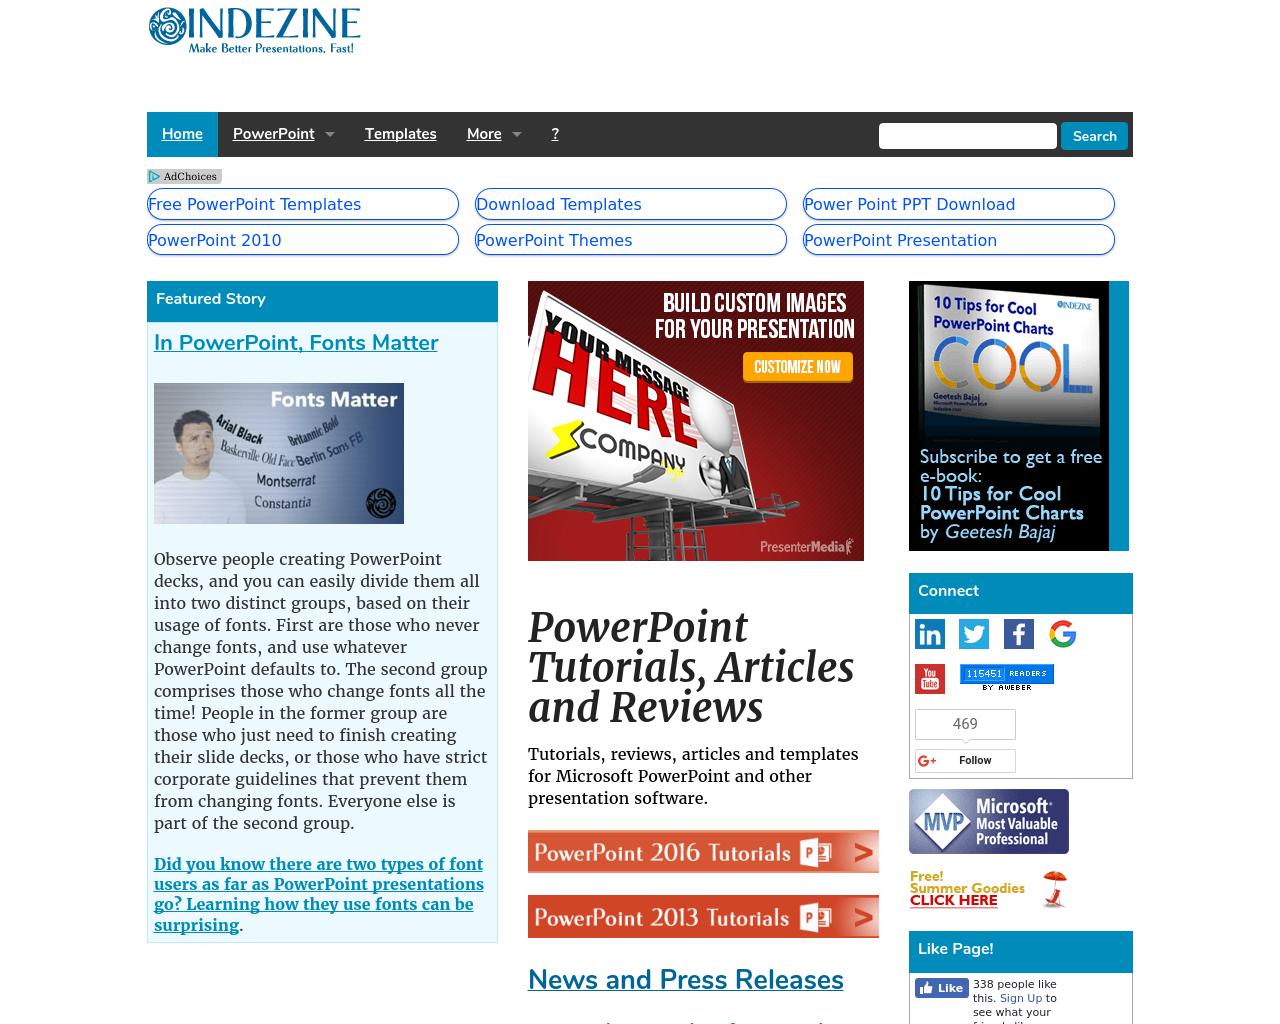 Indezine-Advertising-Reviews-Pricing